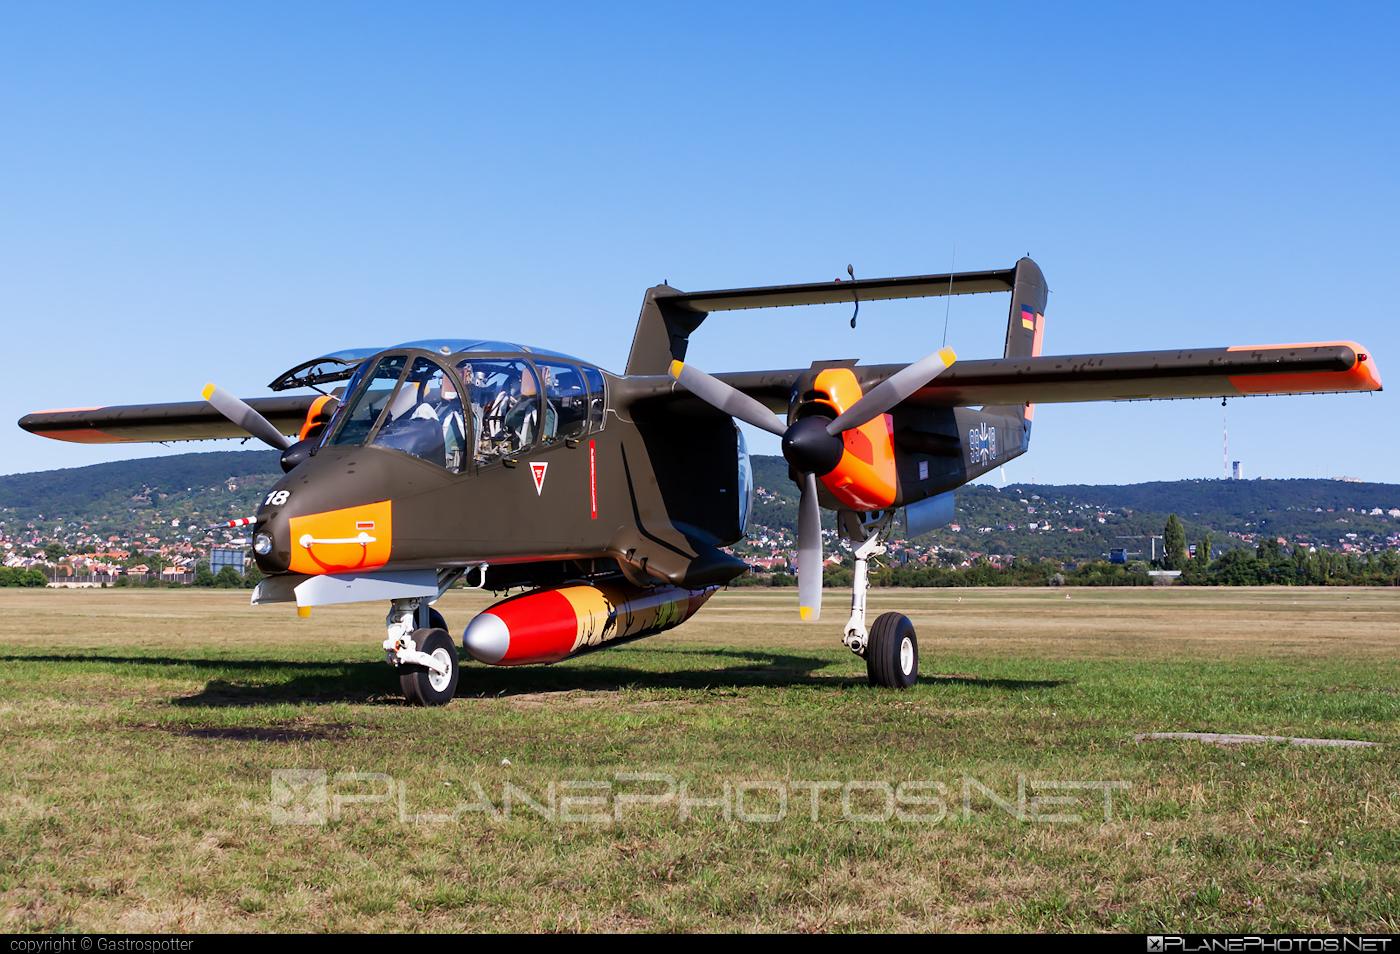 North American Rockwell OV-10B Bronco - G-ONAA operated by Private operator #northamericanrockwell